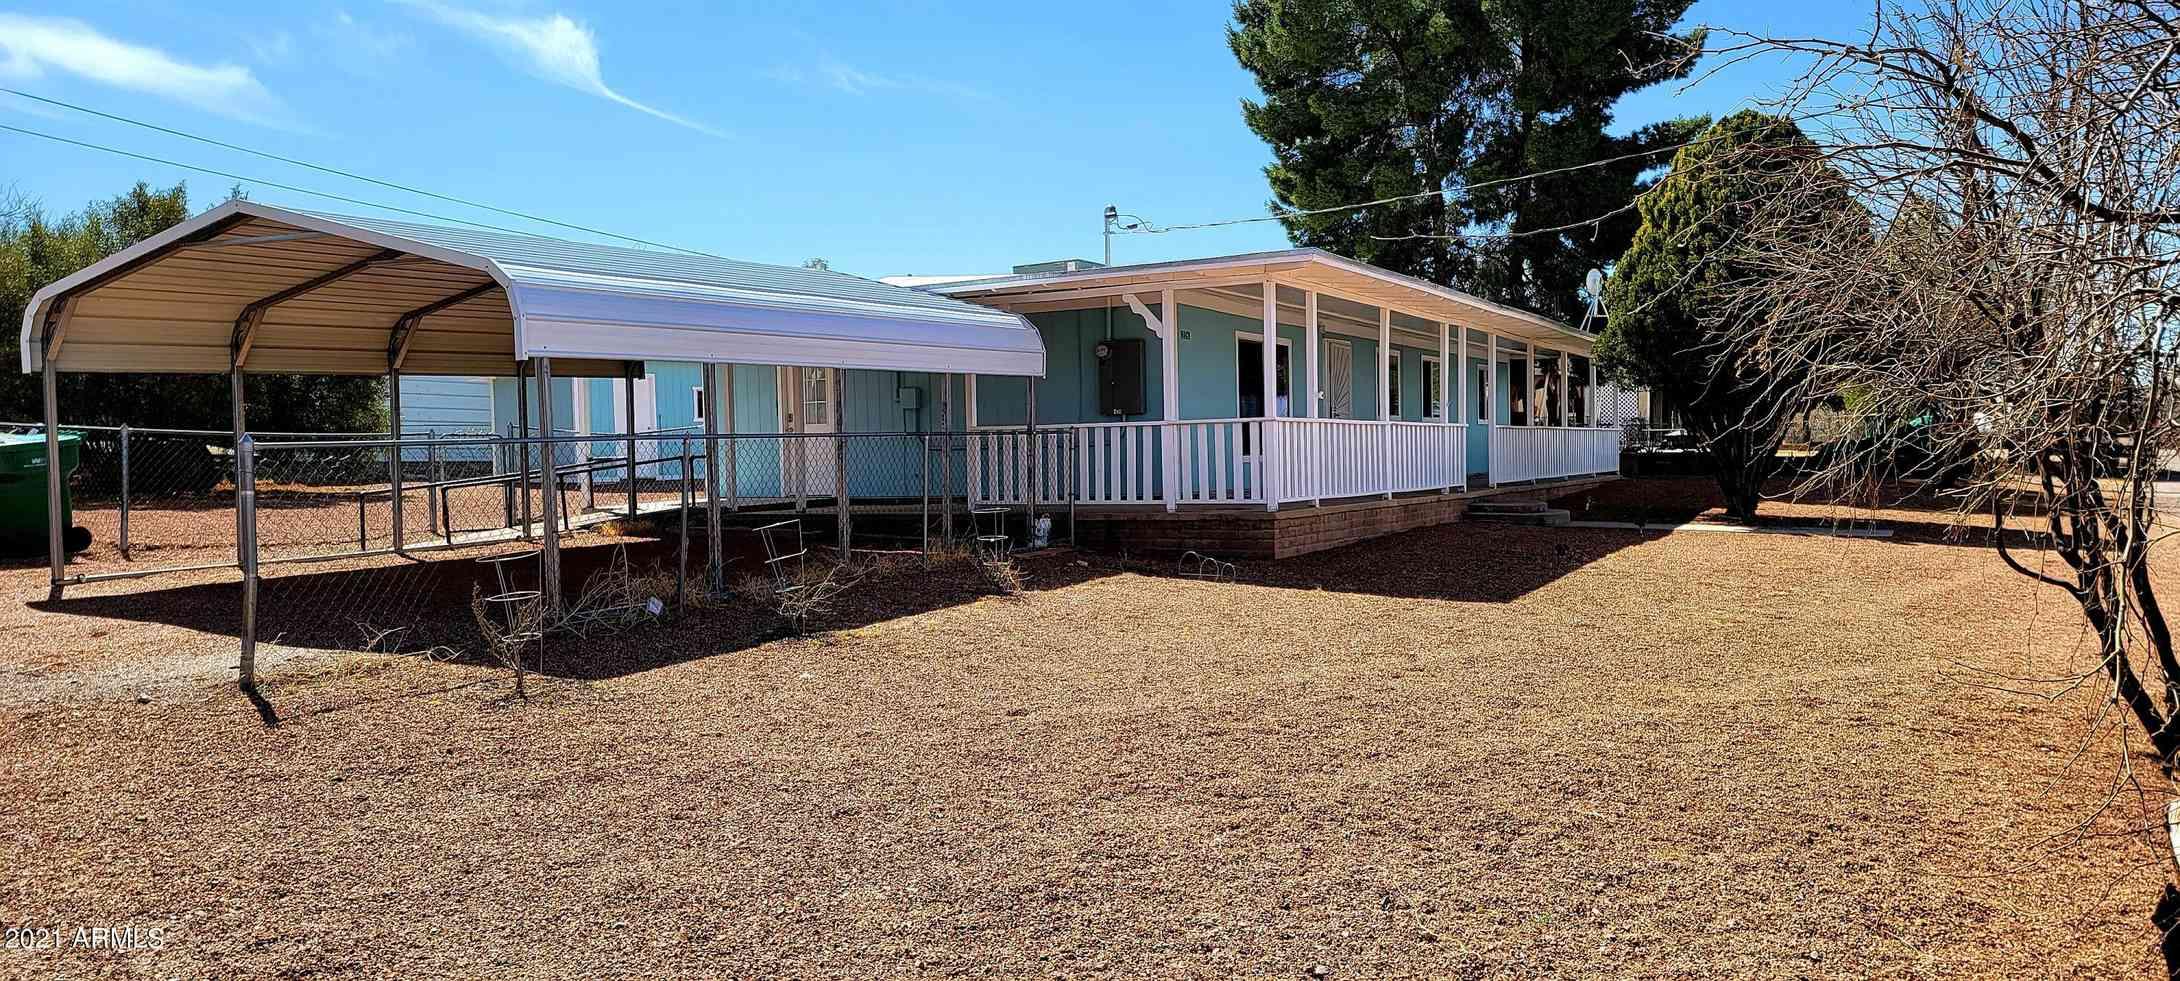 206 S HASKELL Street, Tombstone, AZ, 85638,